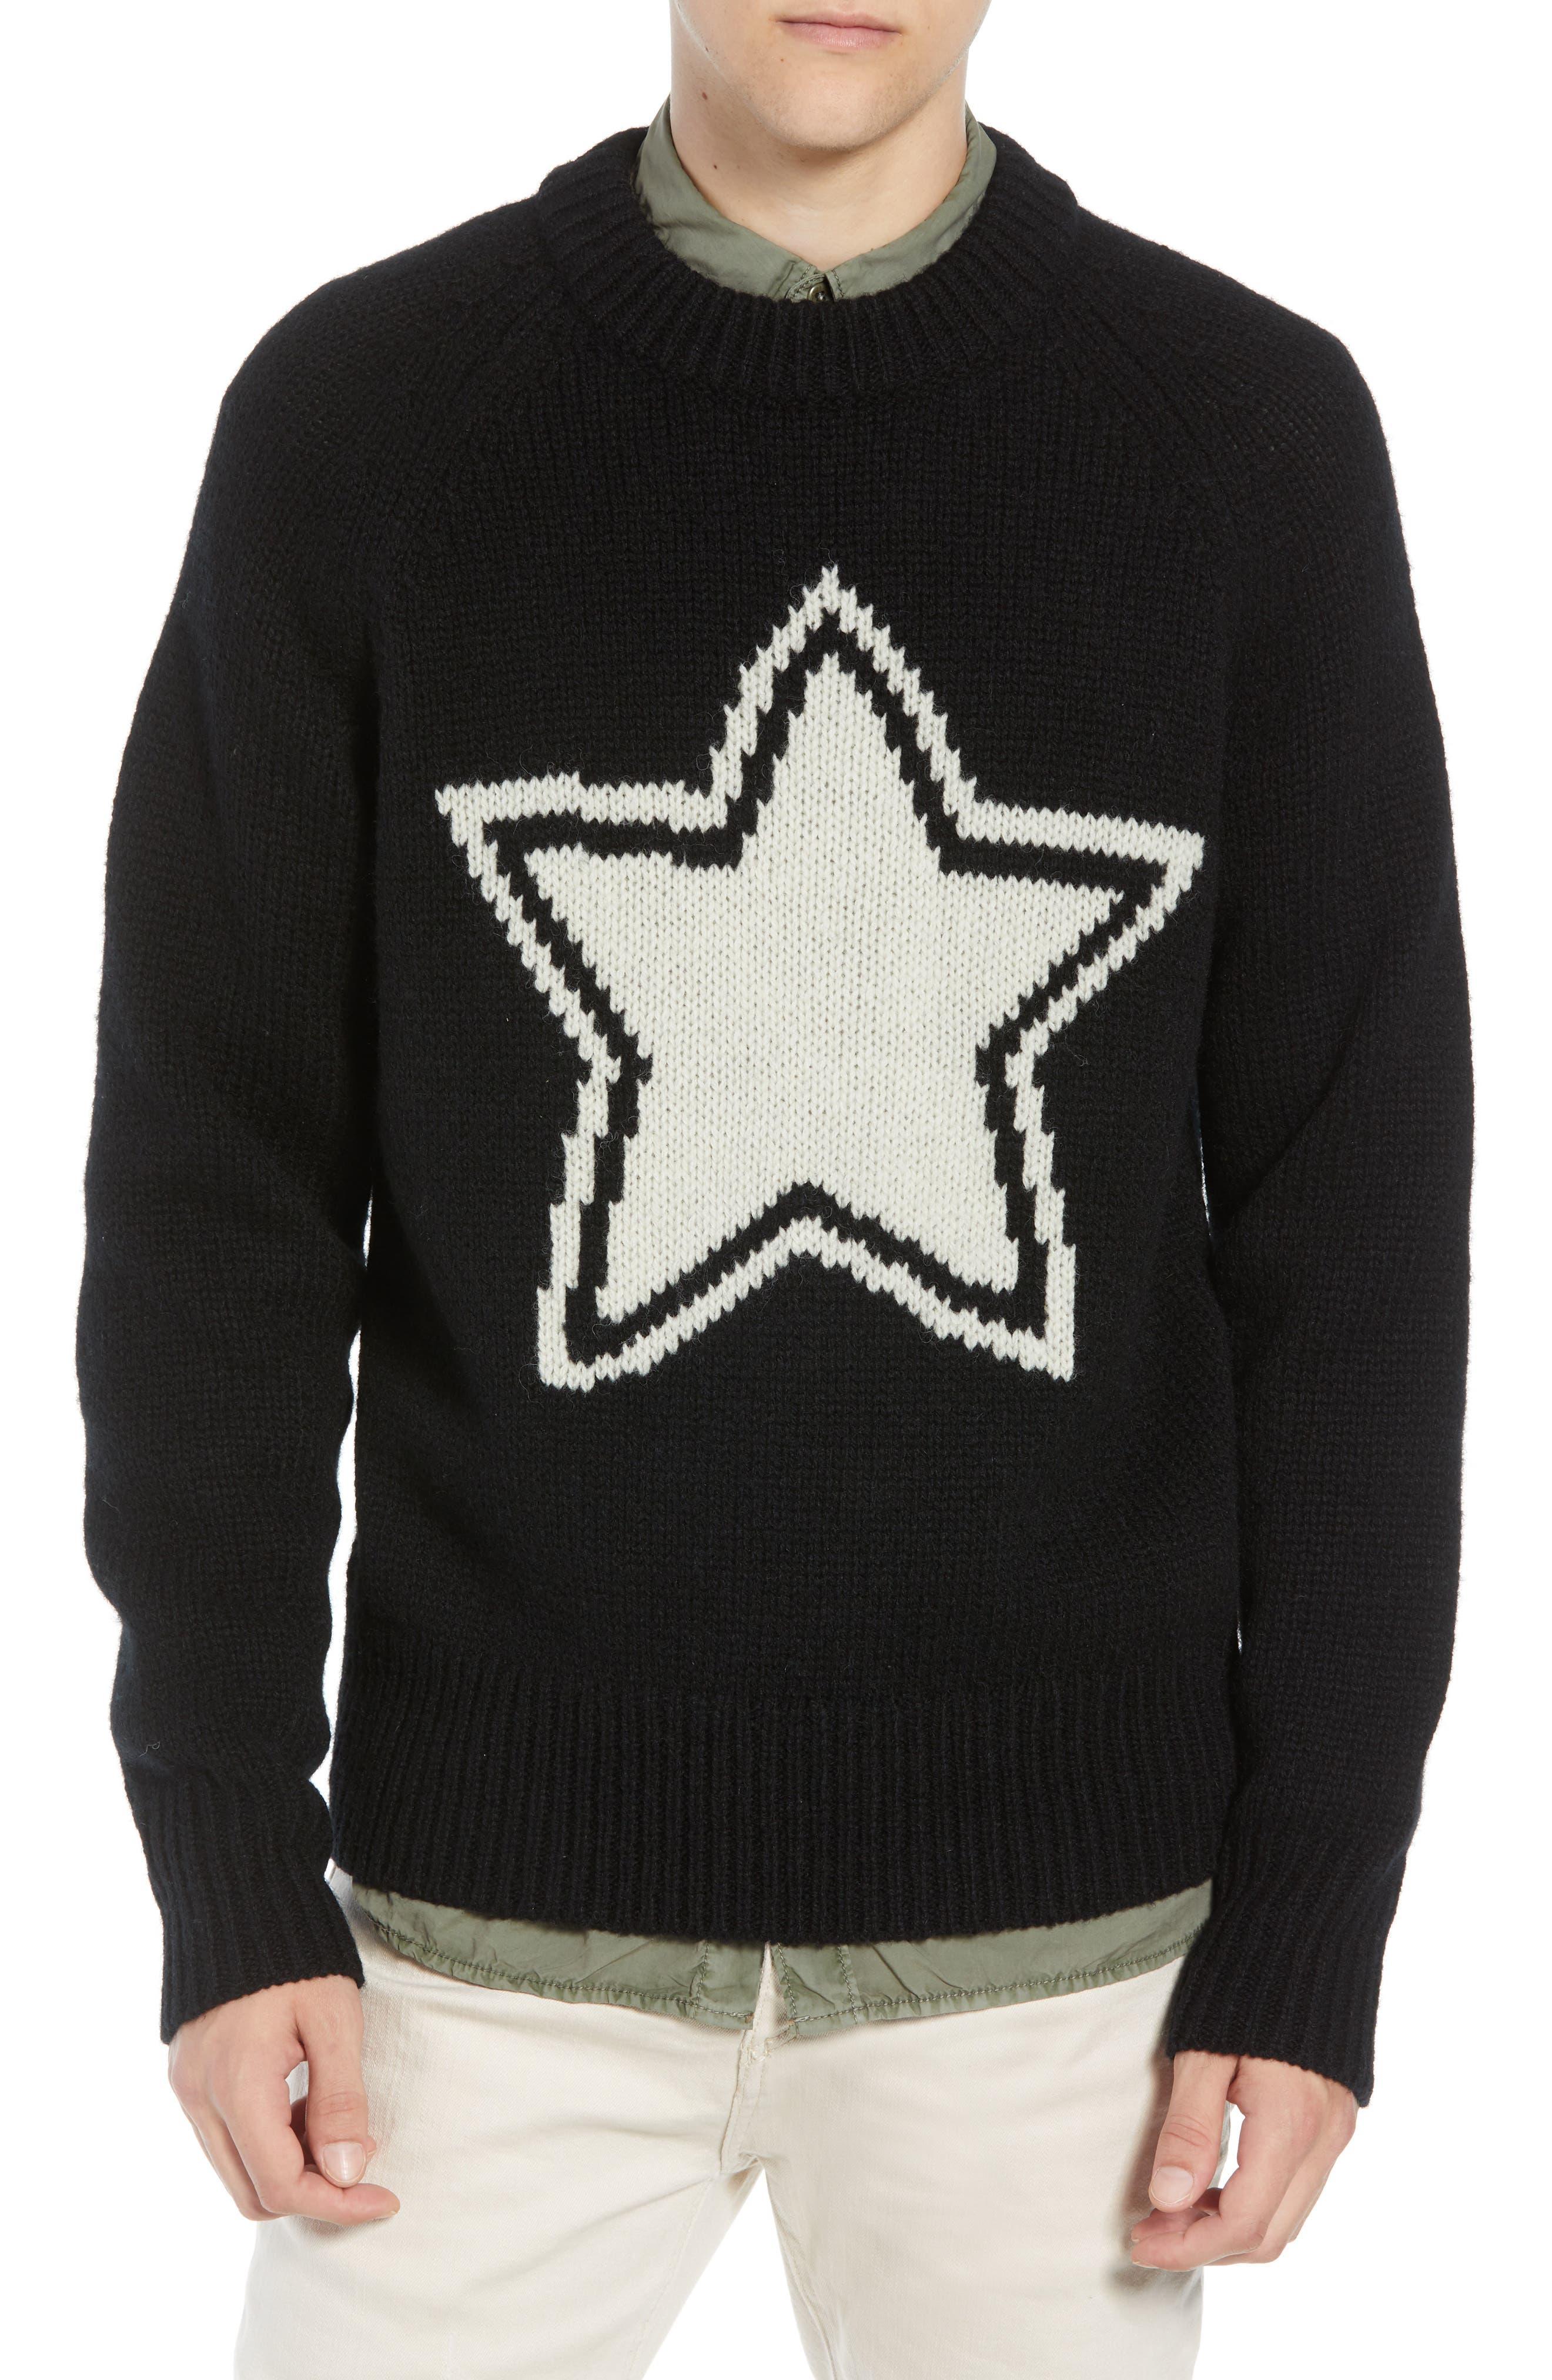 Star Wool Sweater,                             Main thumbnail 1, color,                             BLACK WHITECAP GREY